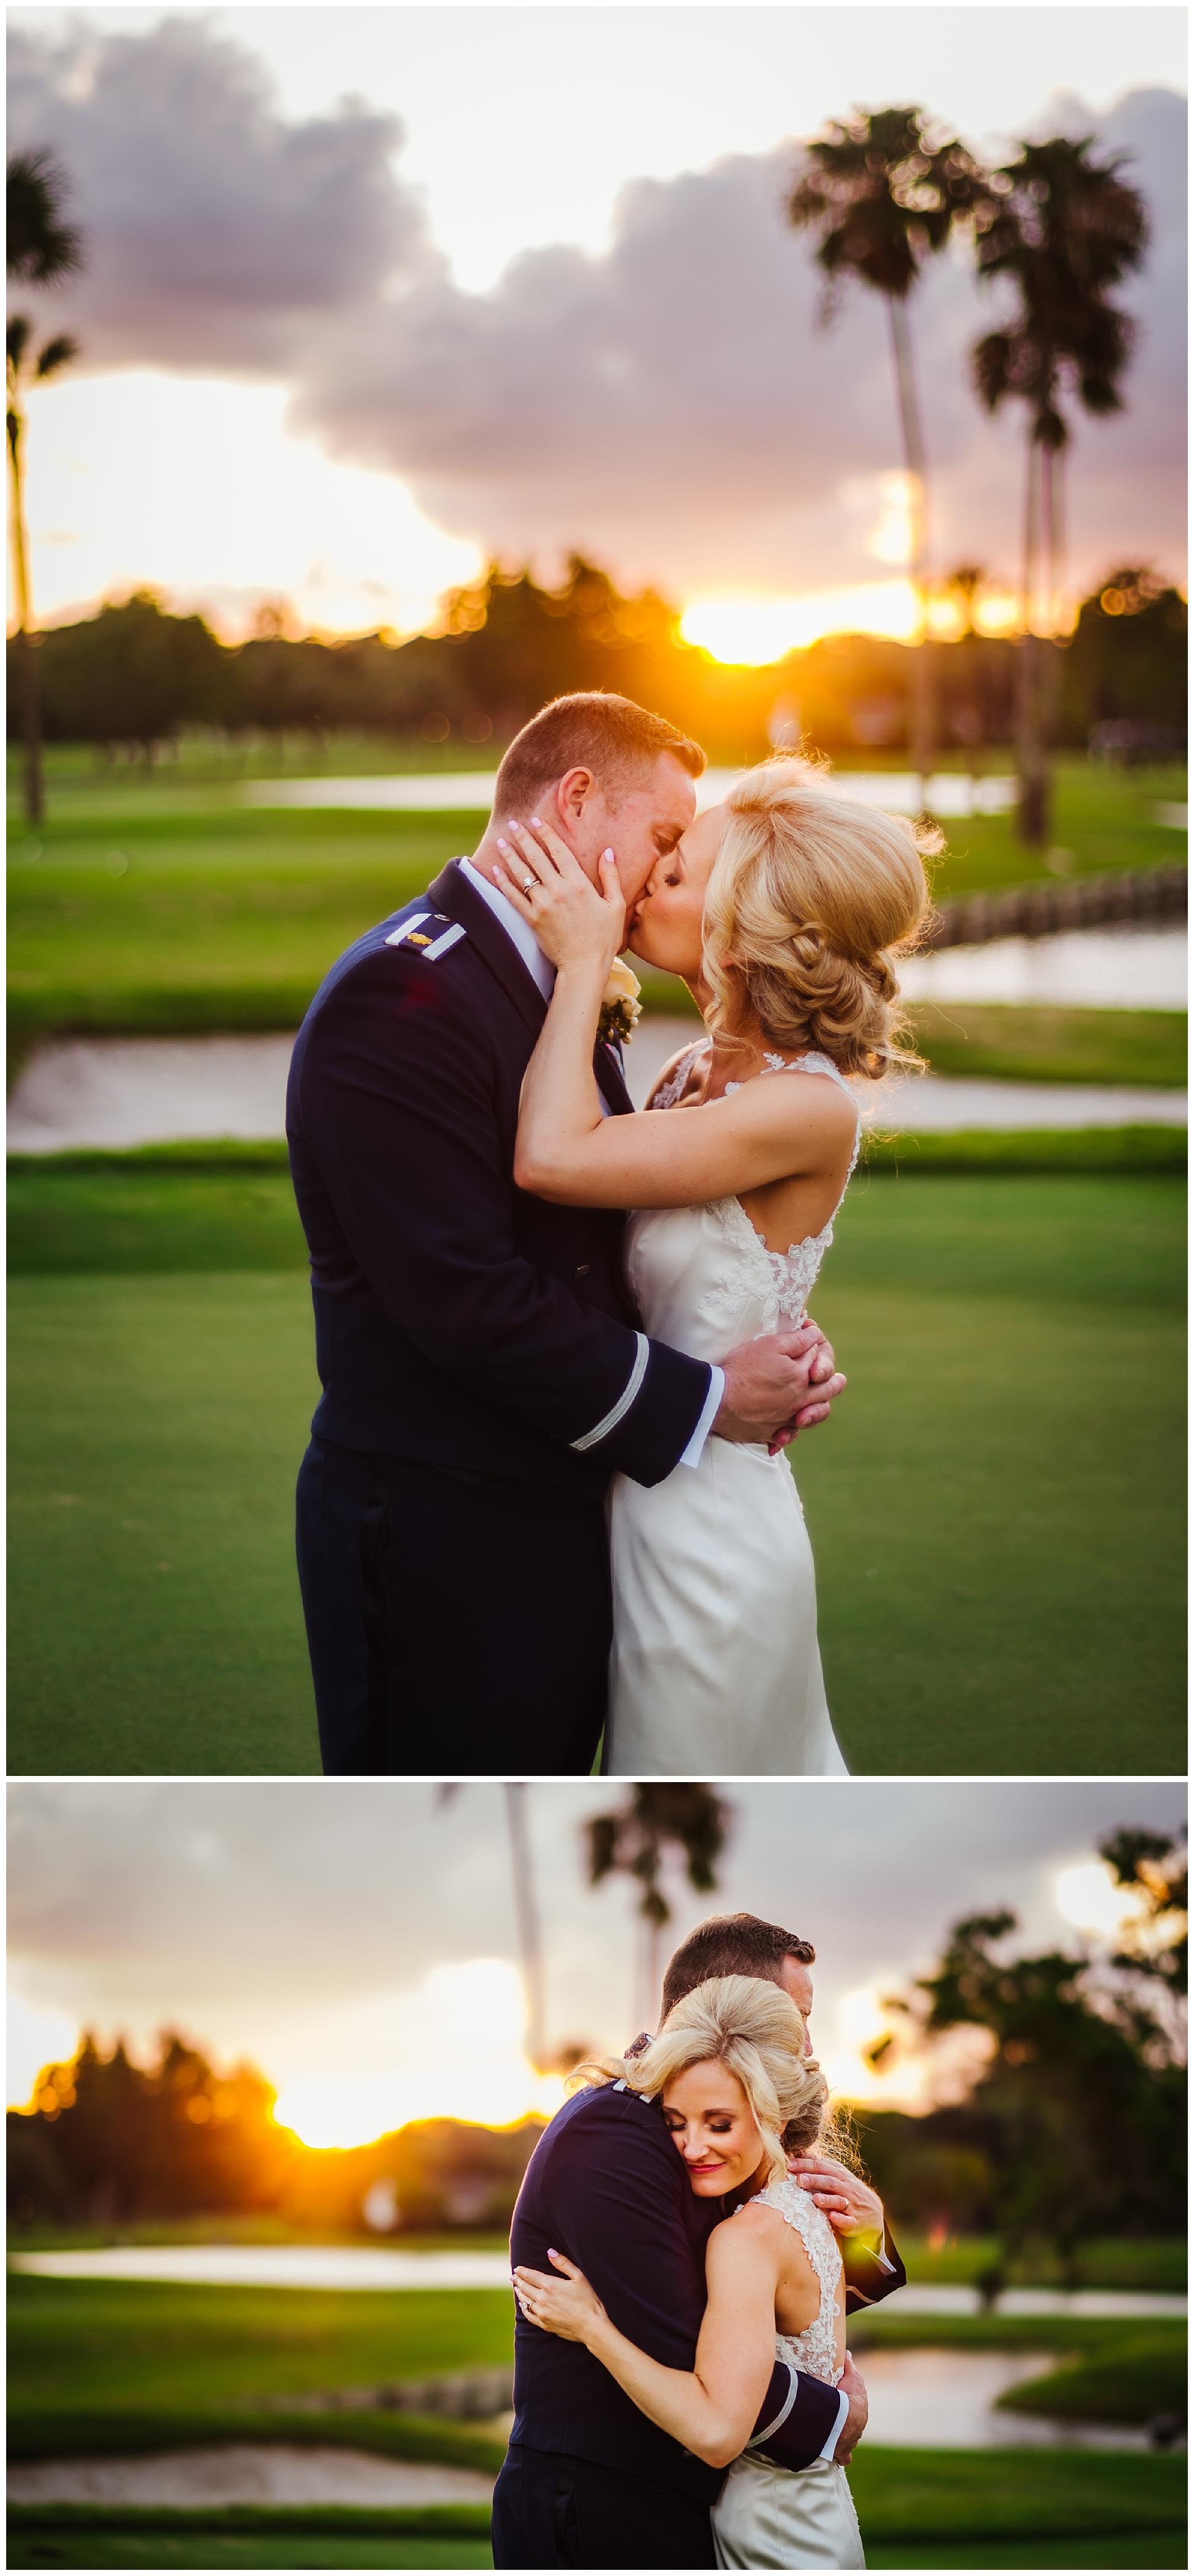 tampa-wedding-photographer-sleeves-palma-ceia-country-club-golf-course-sunset-luxury_0100.jpg